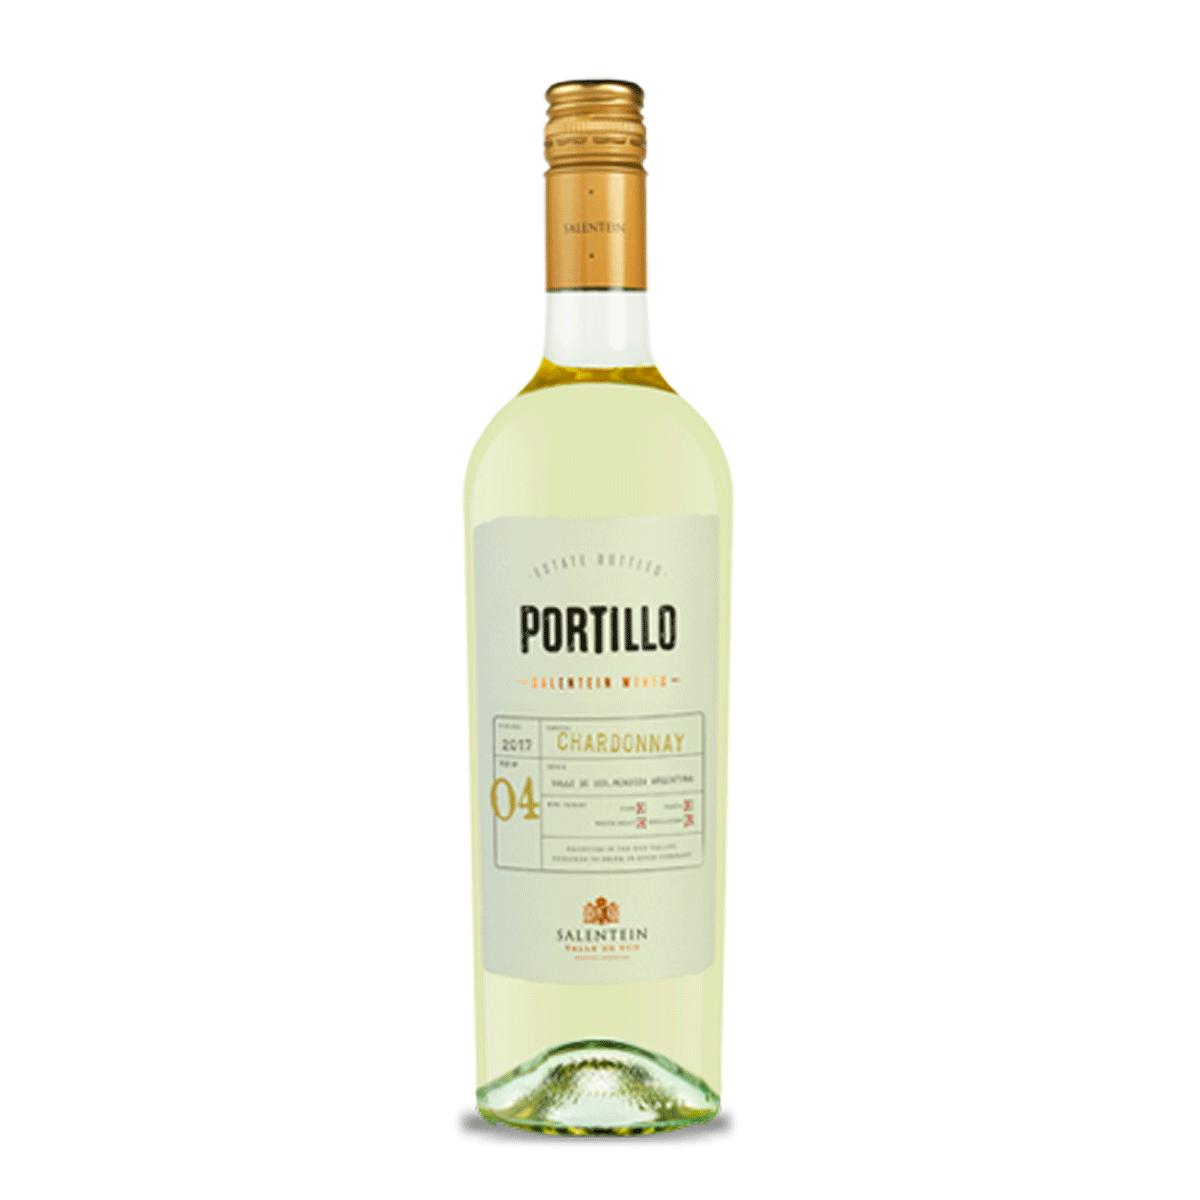 Bodegas-Salentein-Portillo-Chardonnay